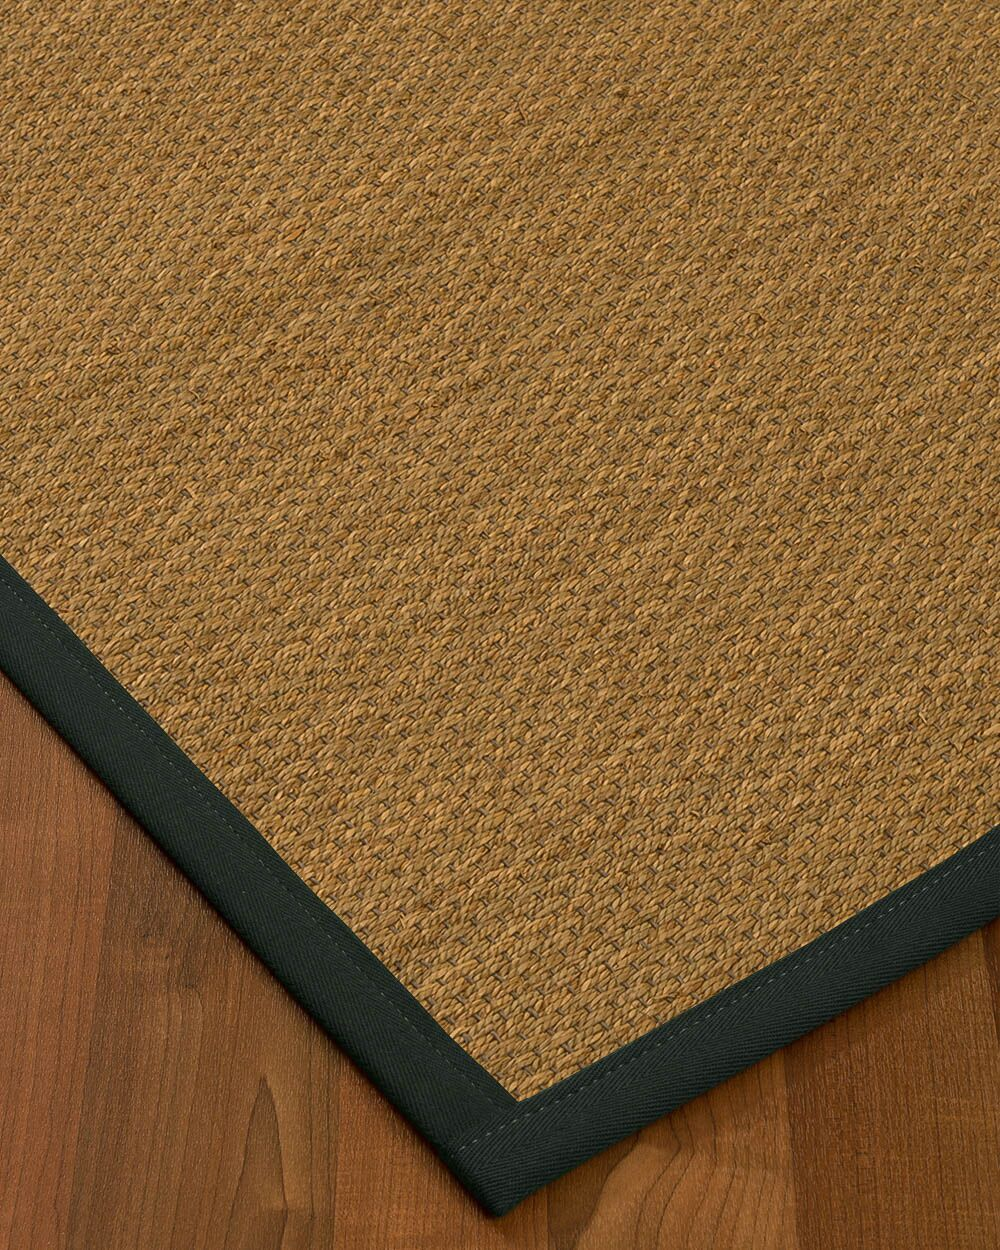 Chavis Border Hand-Woven Beige/Onyx Area Rug Rug Size: Rectangle 8' x 10', Rug Pad Included: Yes